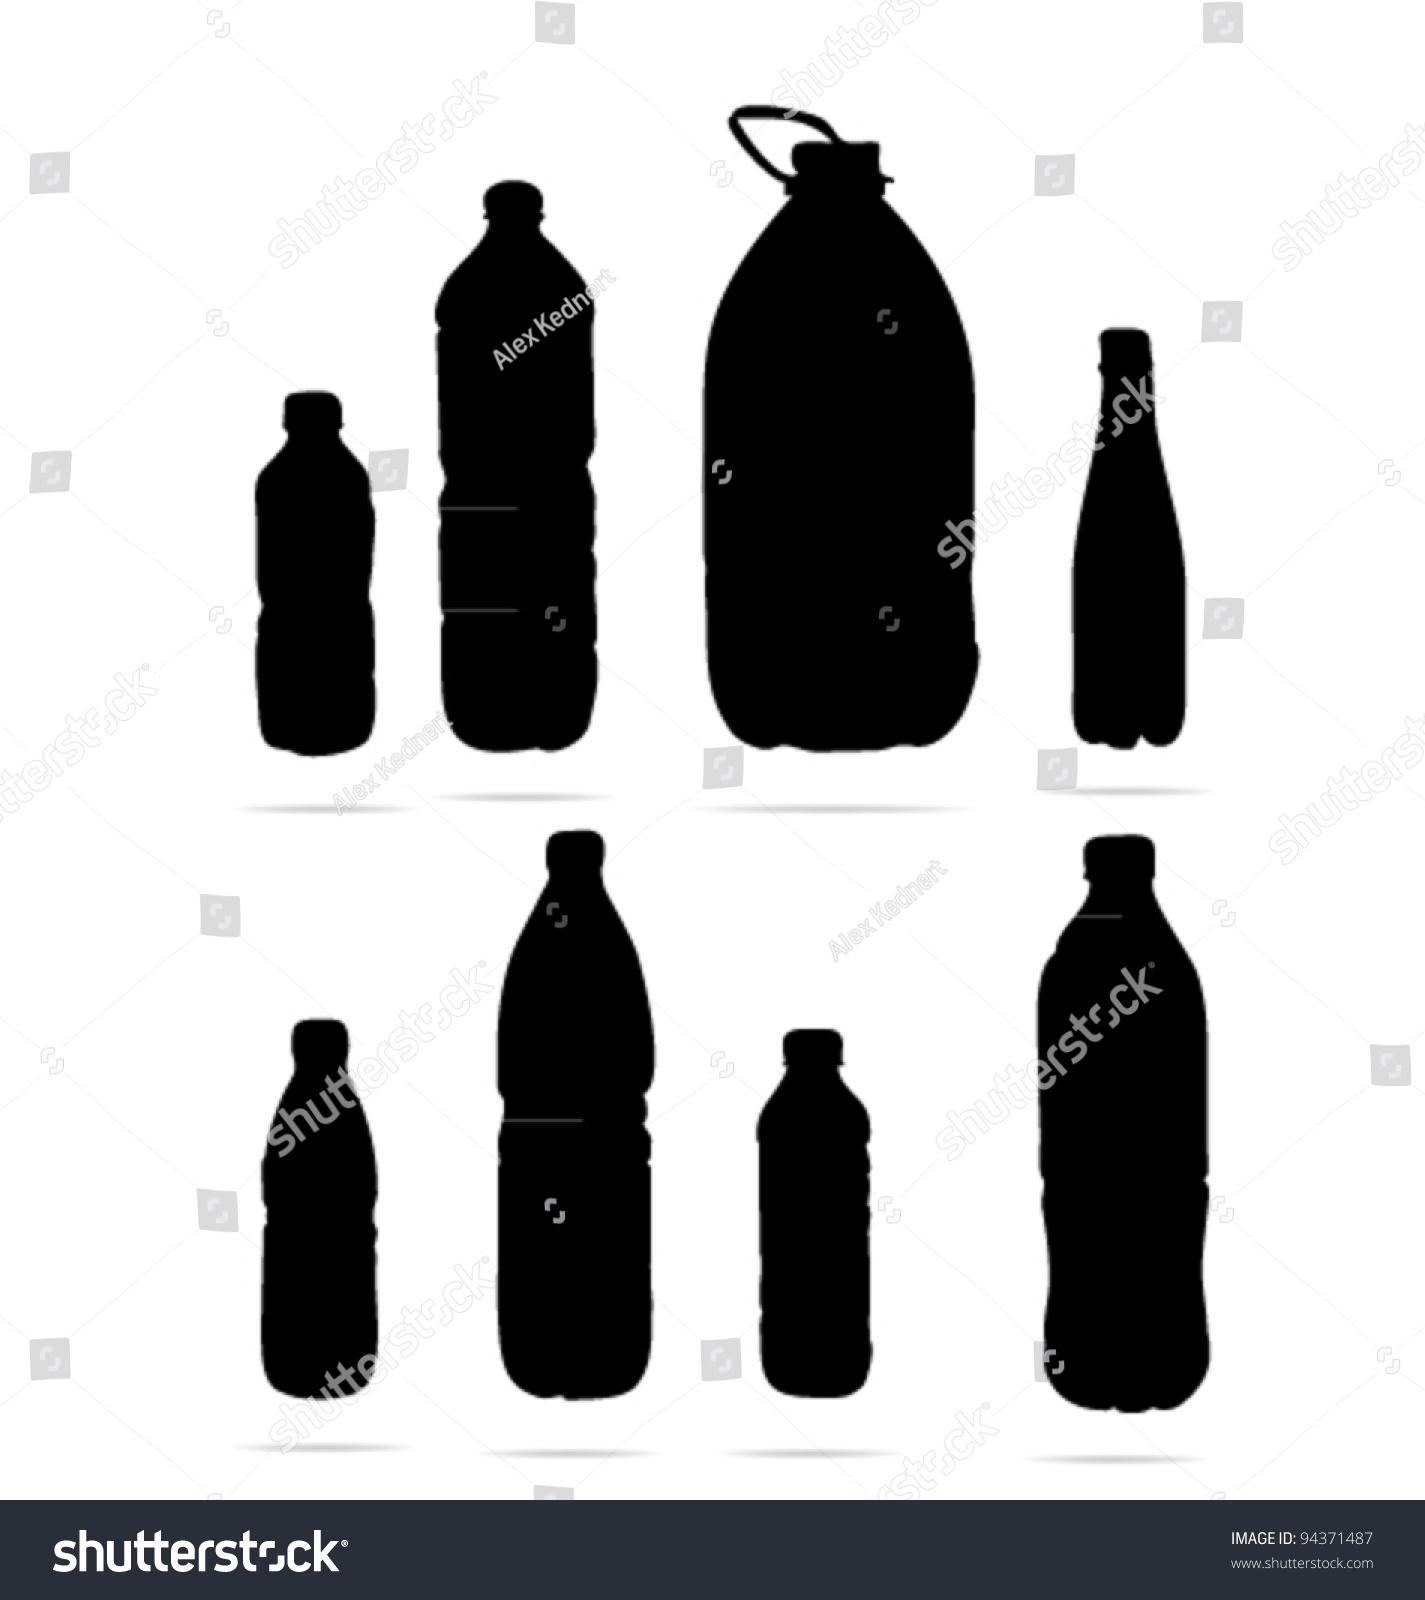 Water Bottle Vector: Water Bottle Sign Isolated Stock Vector Illustration